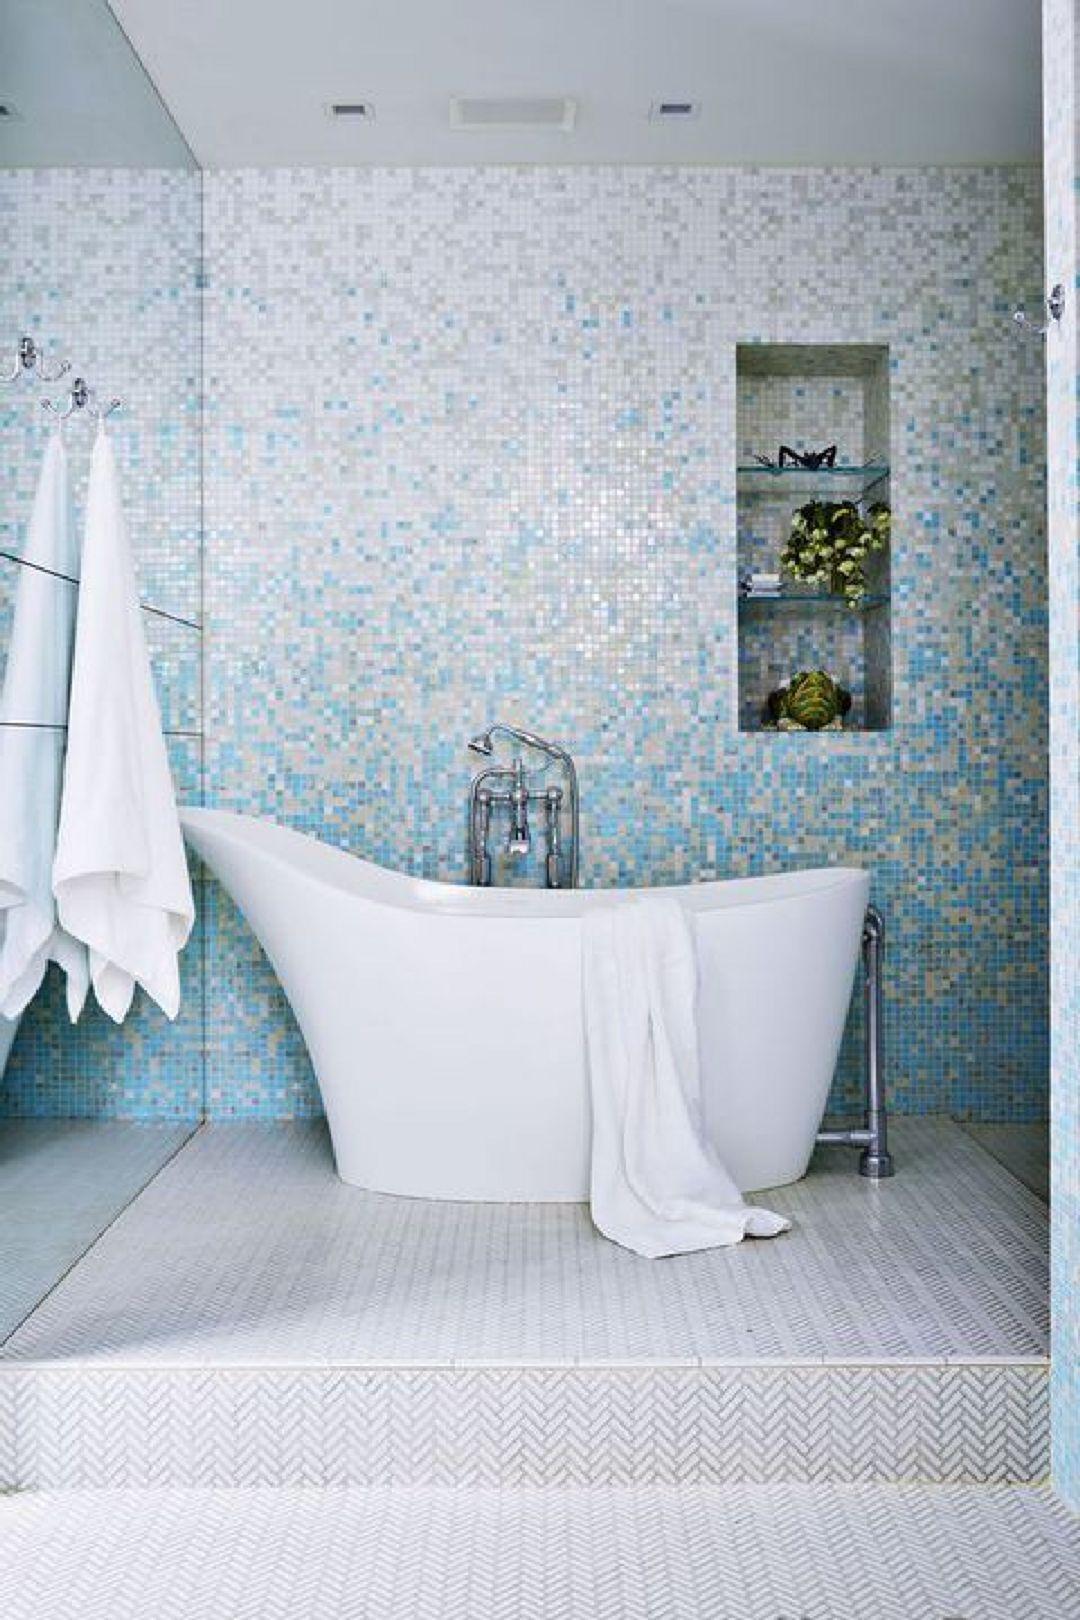 20 the best bathroom floor motif ideas ready to amaze you